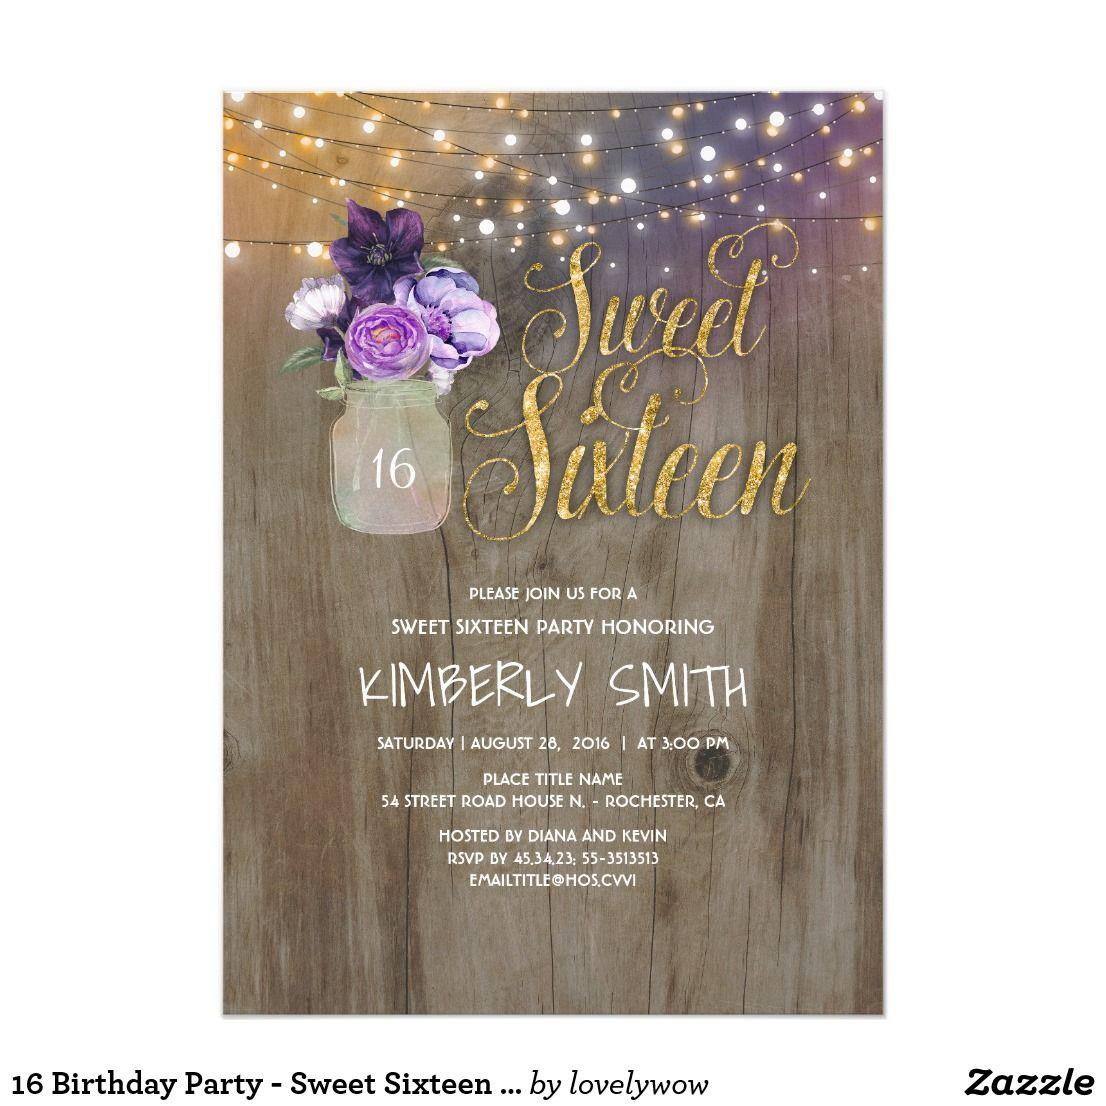 16 Birthday Party - Sweet Sixteen Mason Jar Purple Card 16th ...